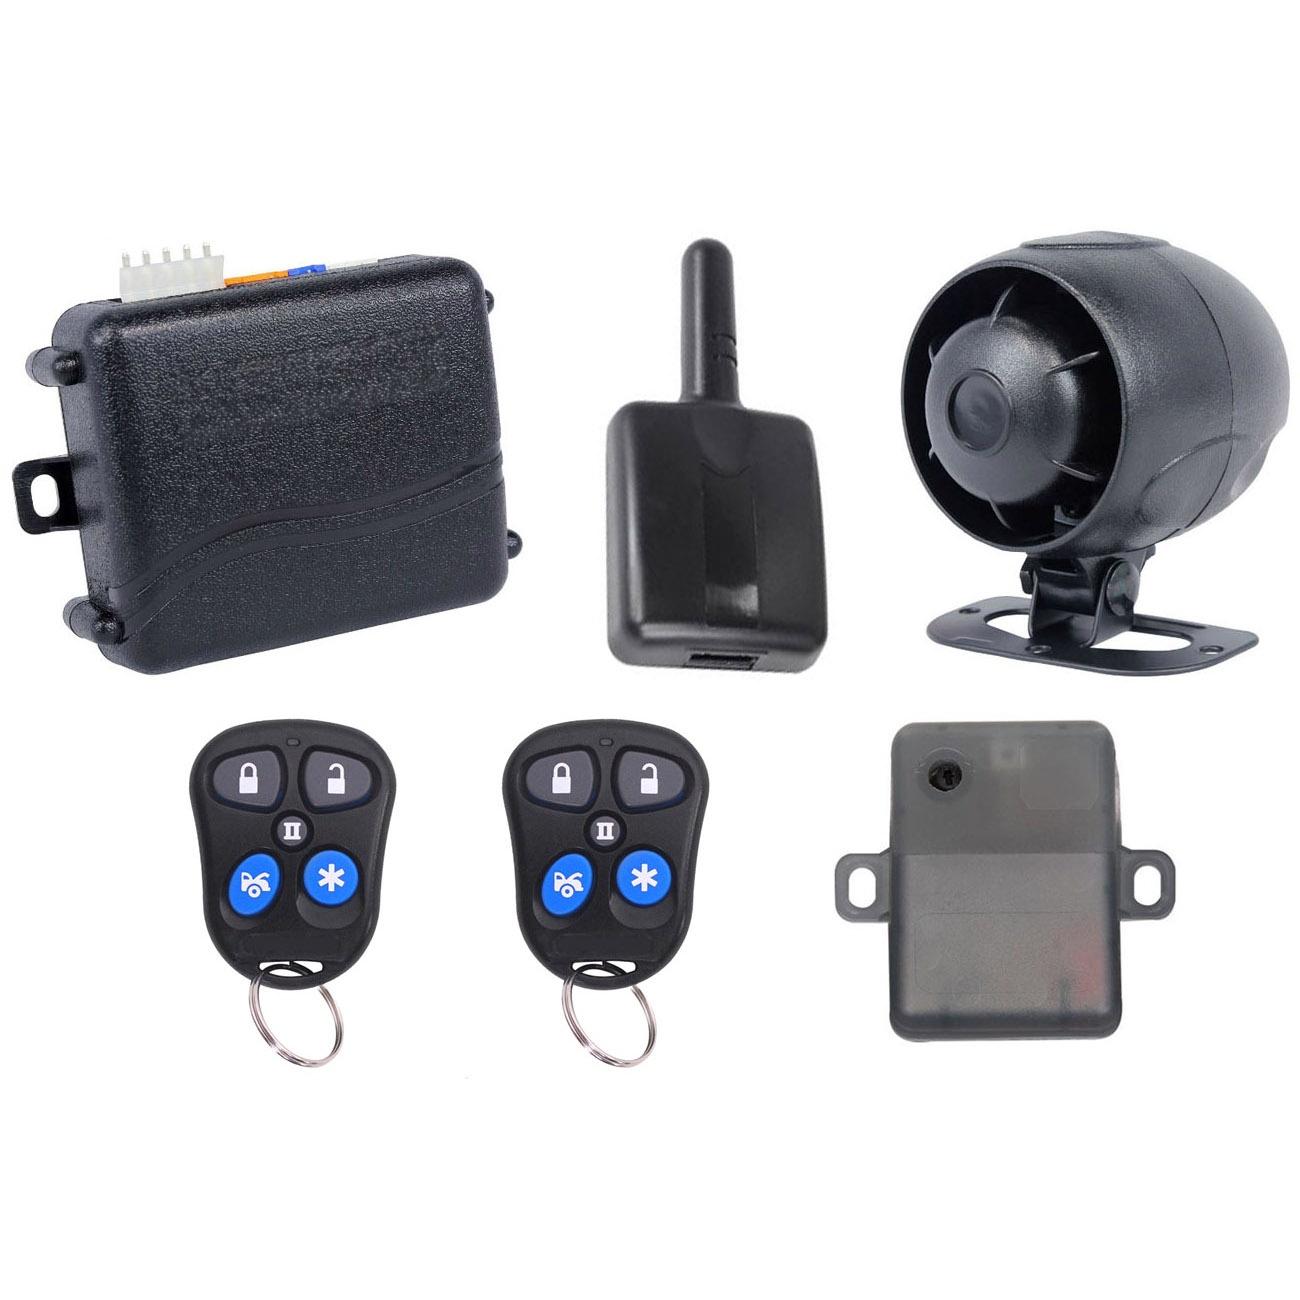 Alarm    Security Systems   Megatronix   GPS Tracking  Fleet Telematics  Smartphone Control